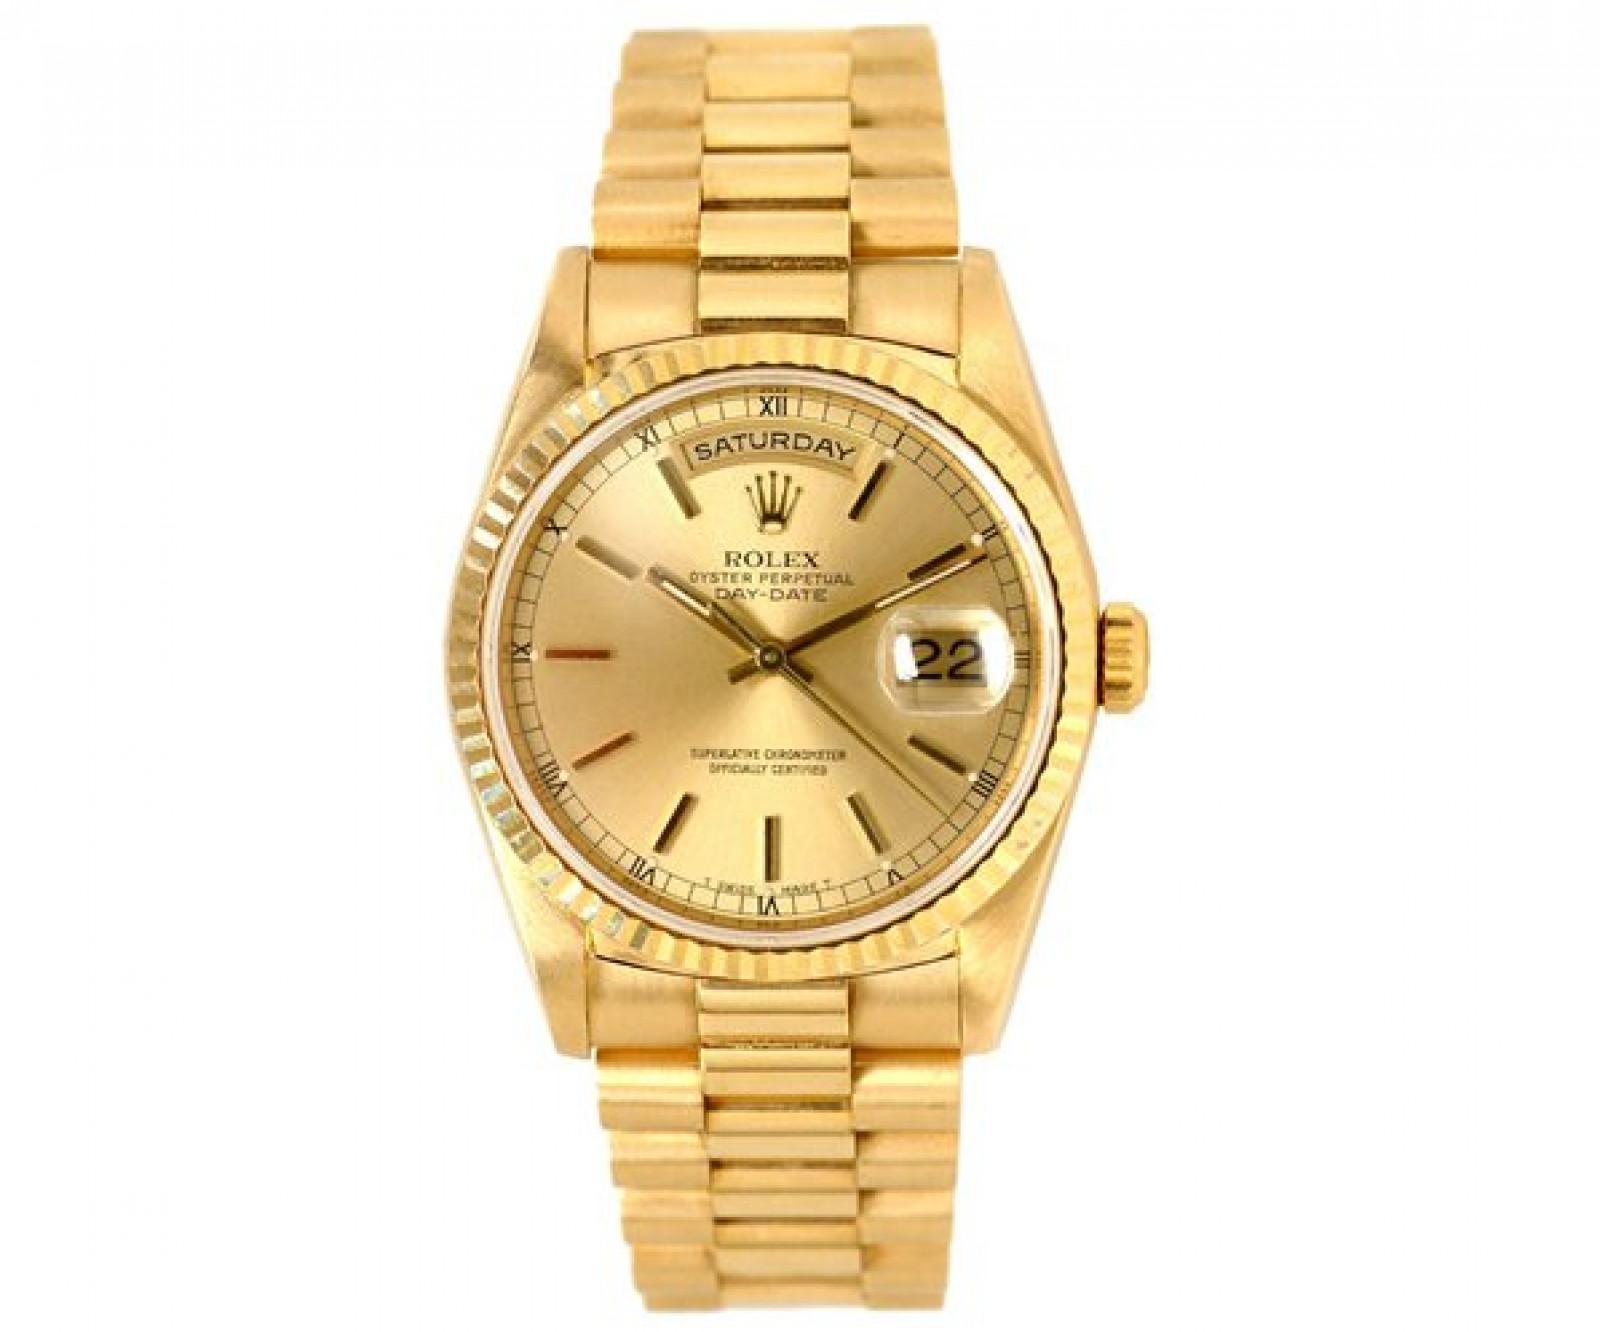 Rolex Day-Date 18238 Gold Champagne 1994